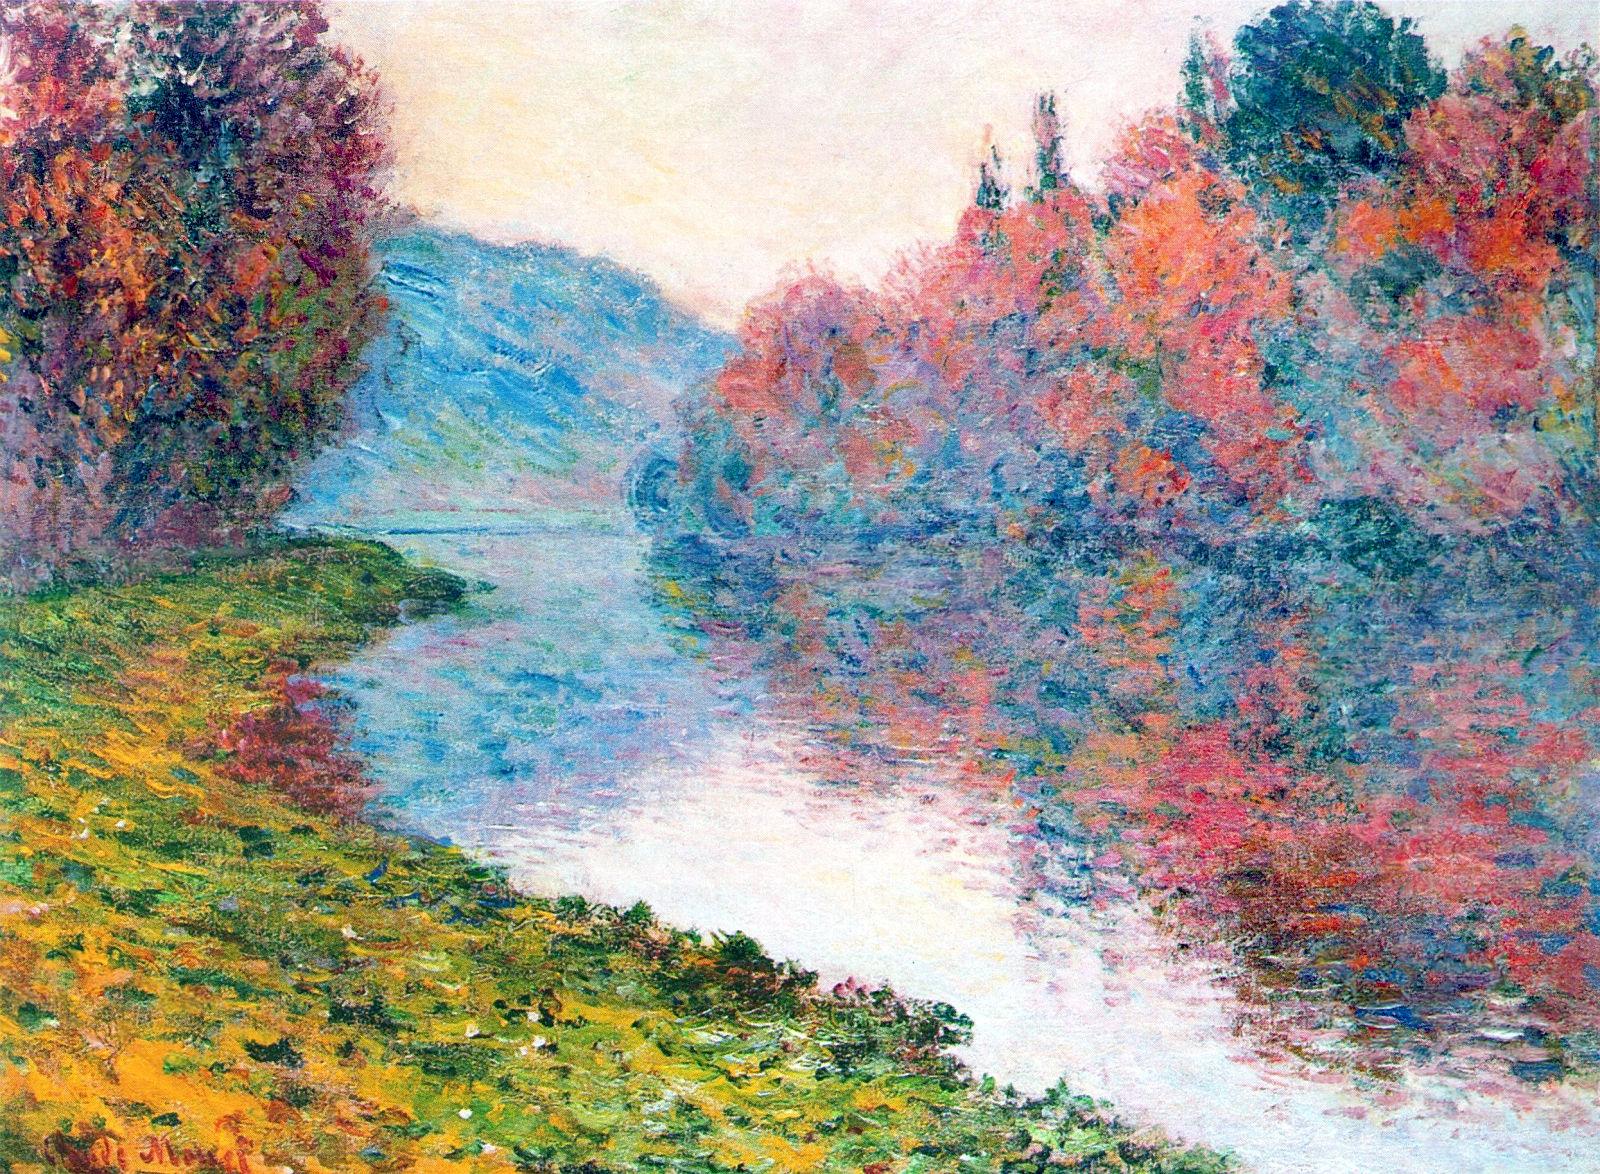 Обои Пейзаж, картина, Жуан-ле-Пен, Клод Моне. Разное foto 7